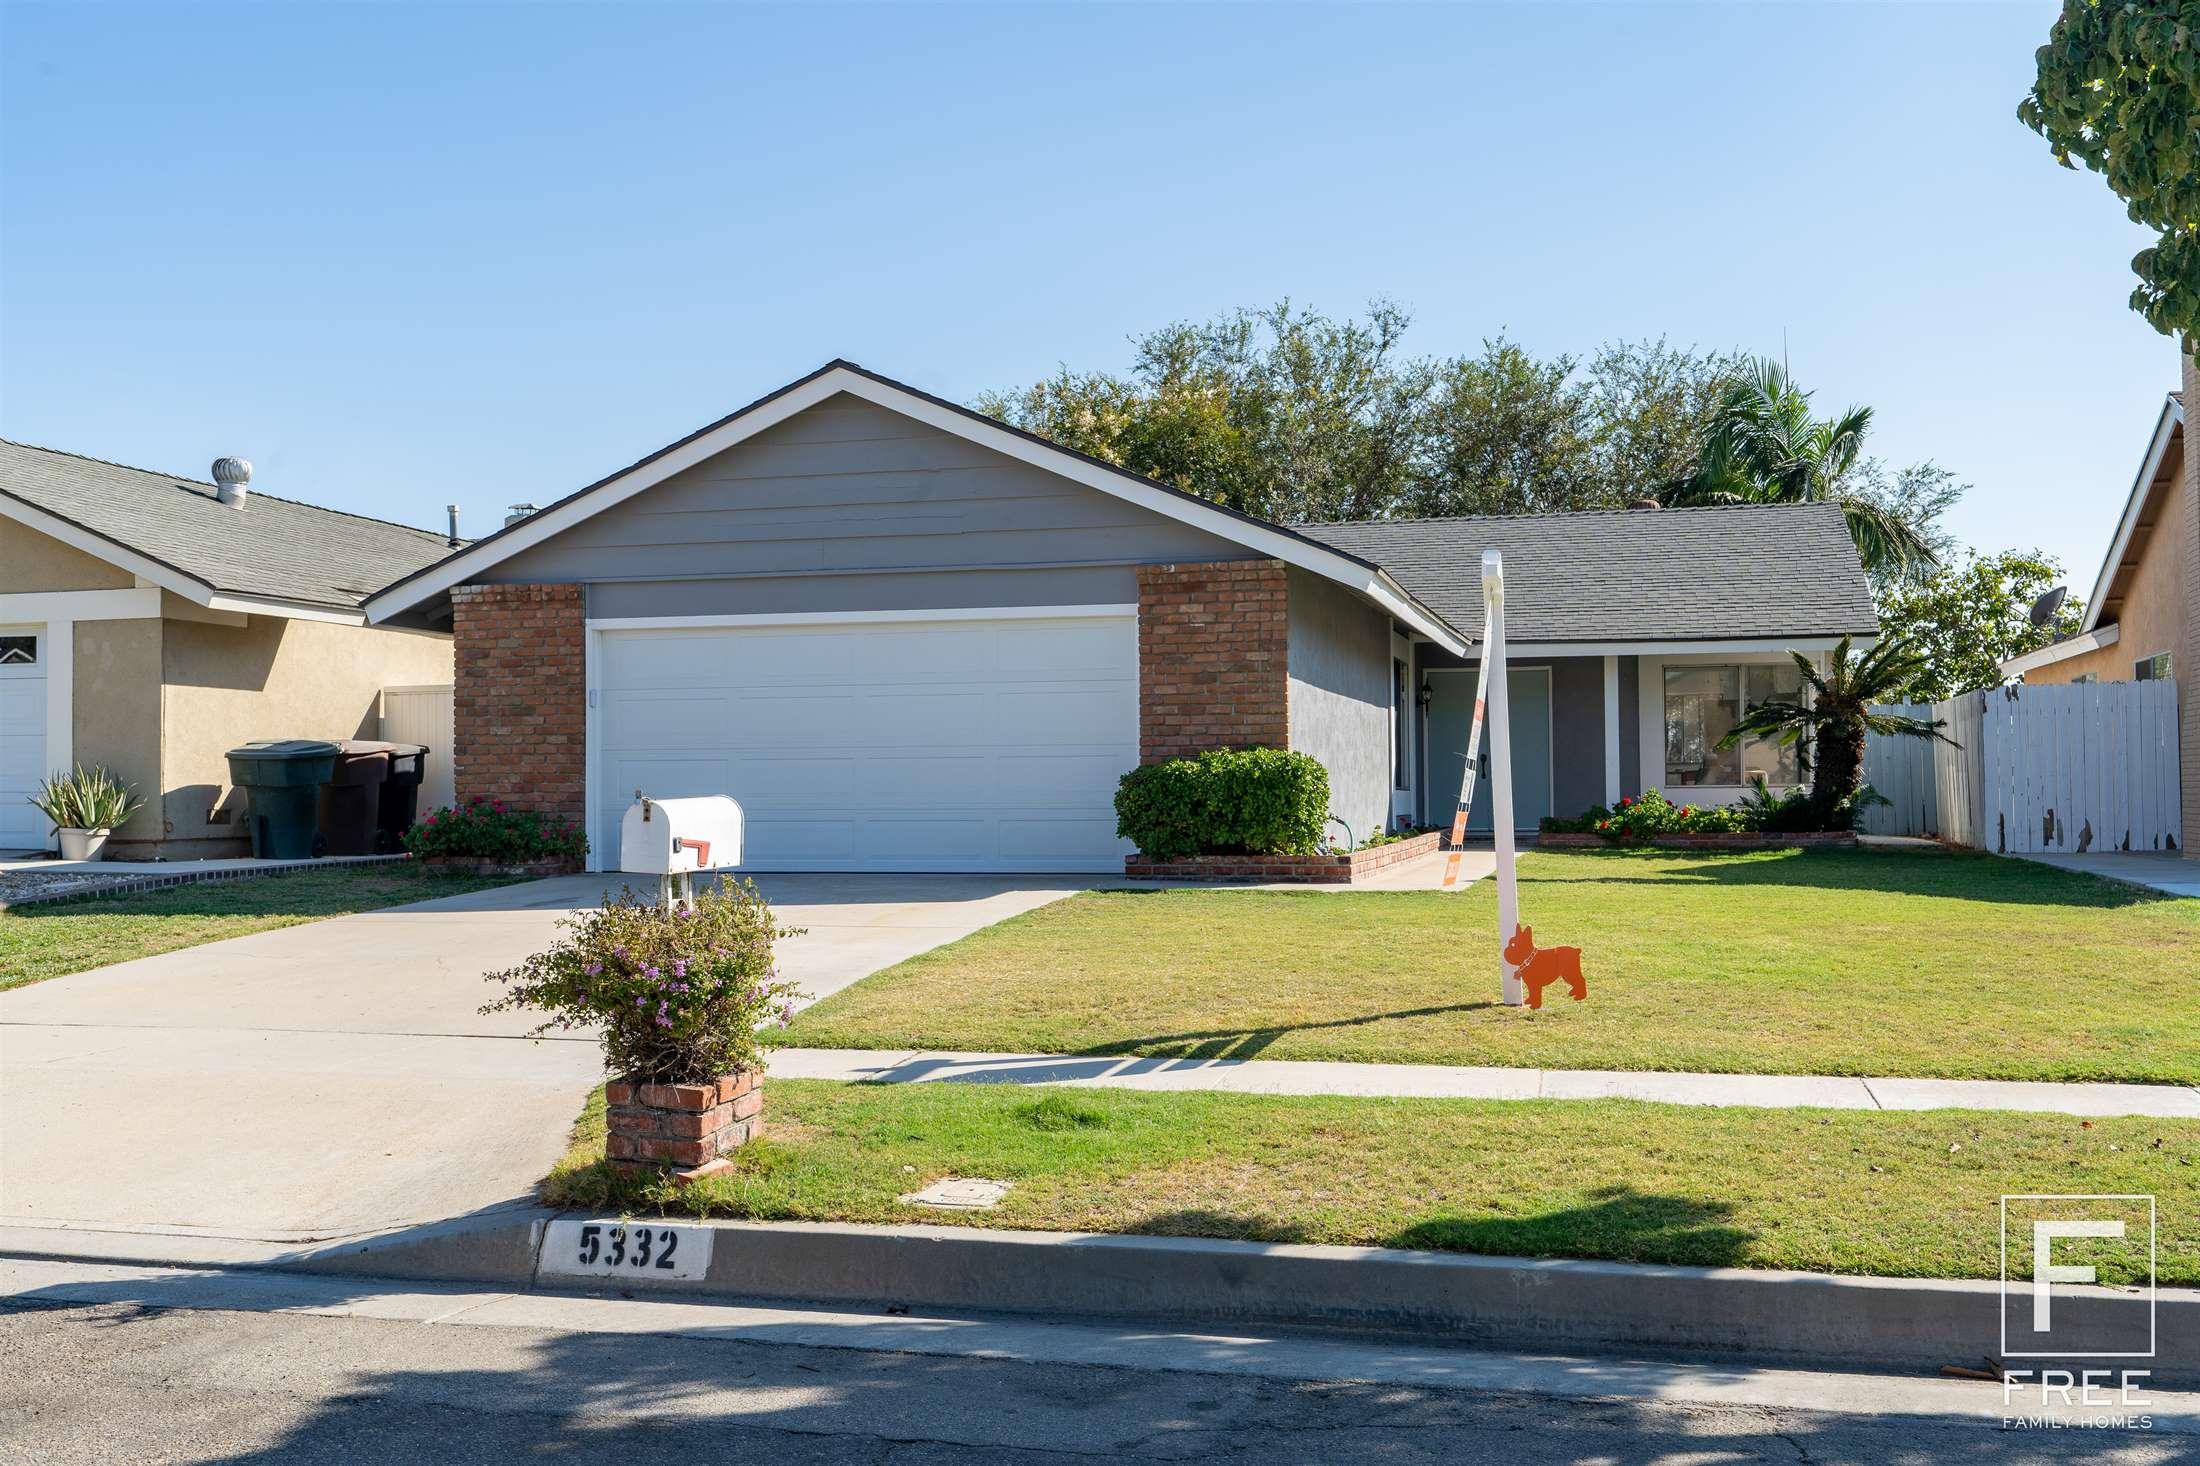 5332 East Cresthill Drive, Anaheim, CA 92807